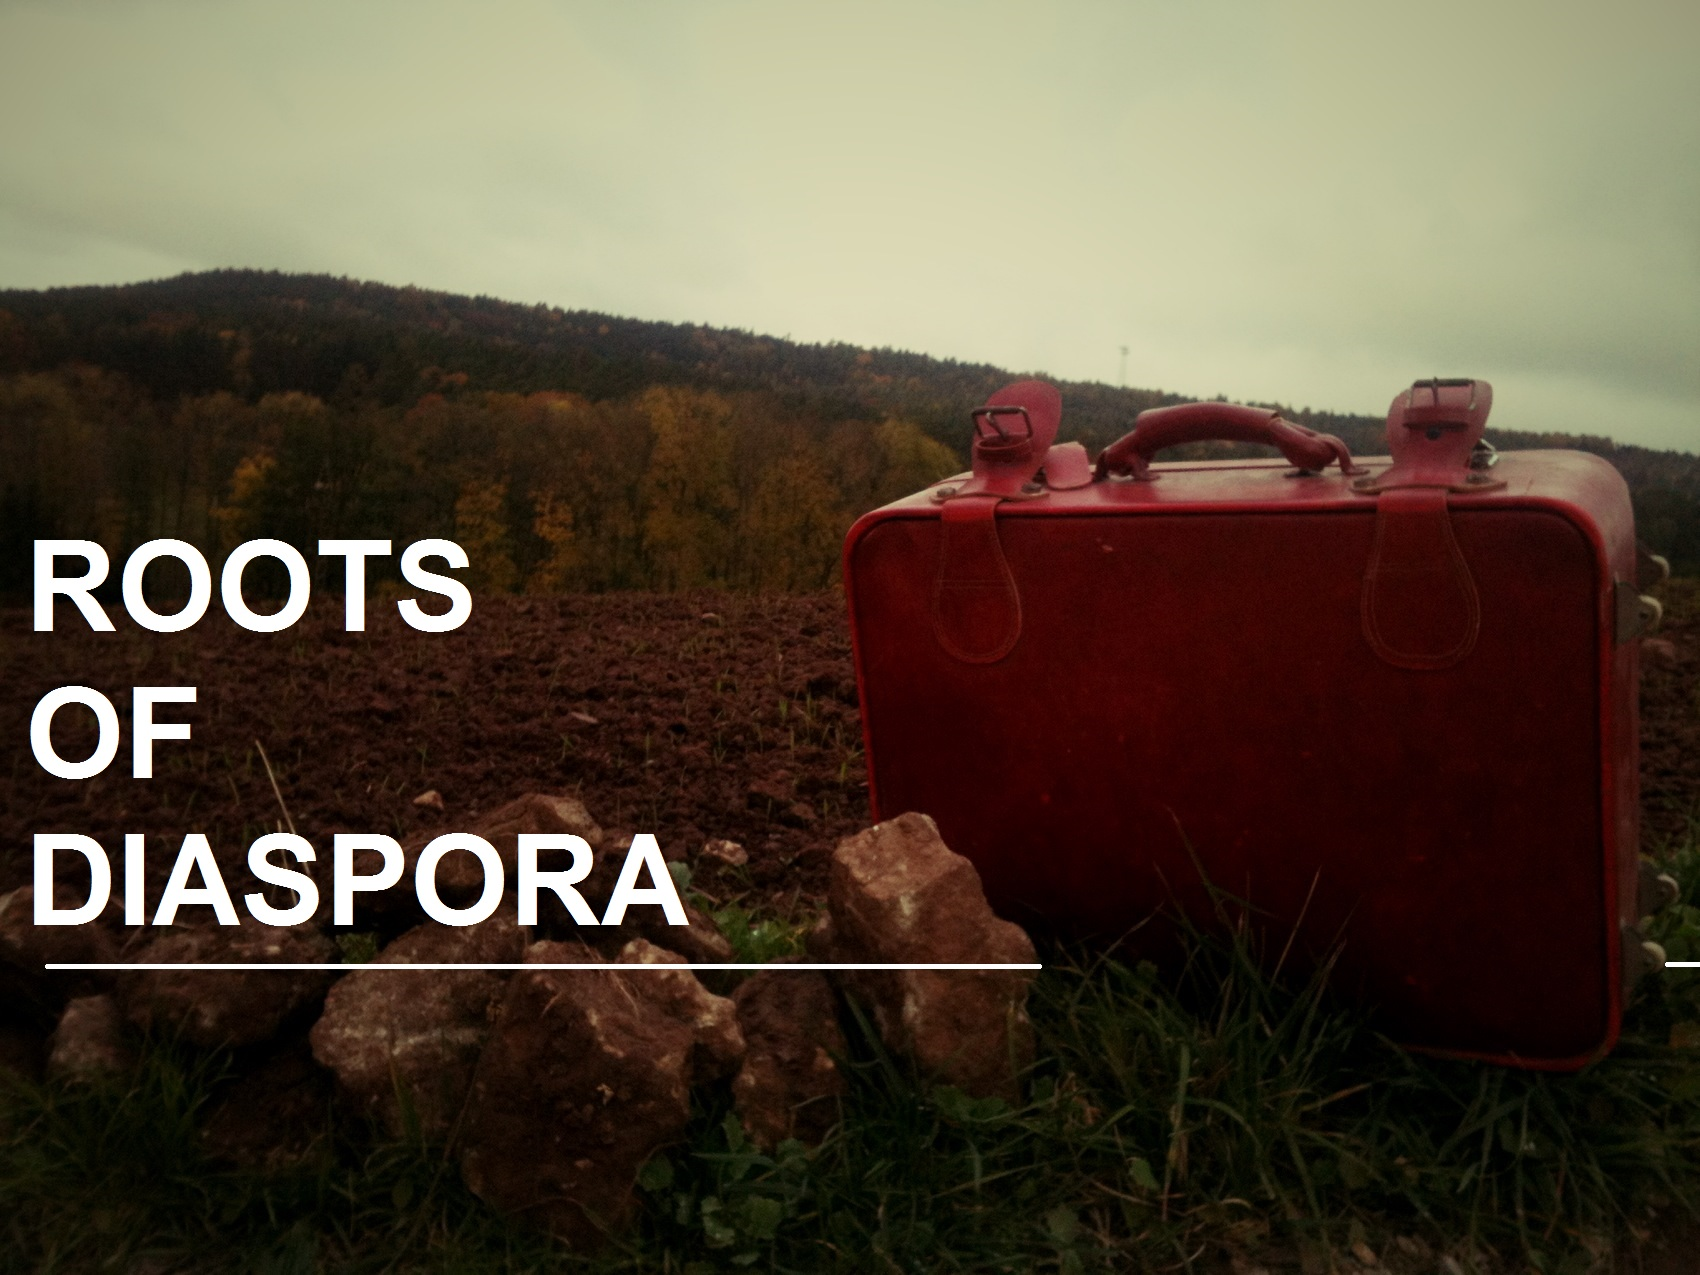 rootsofdiasporabanner3